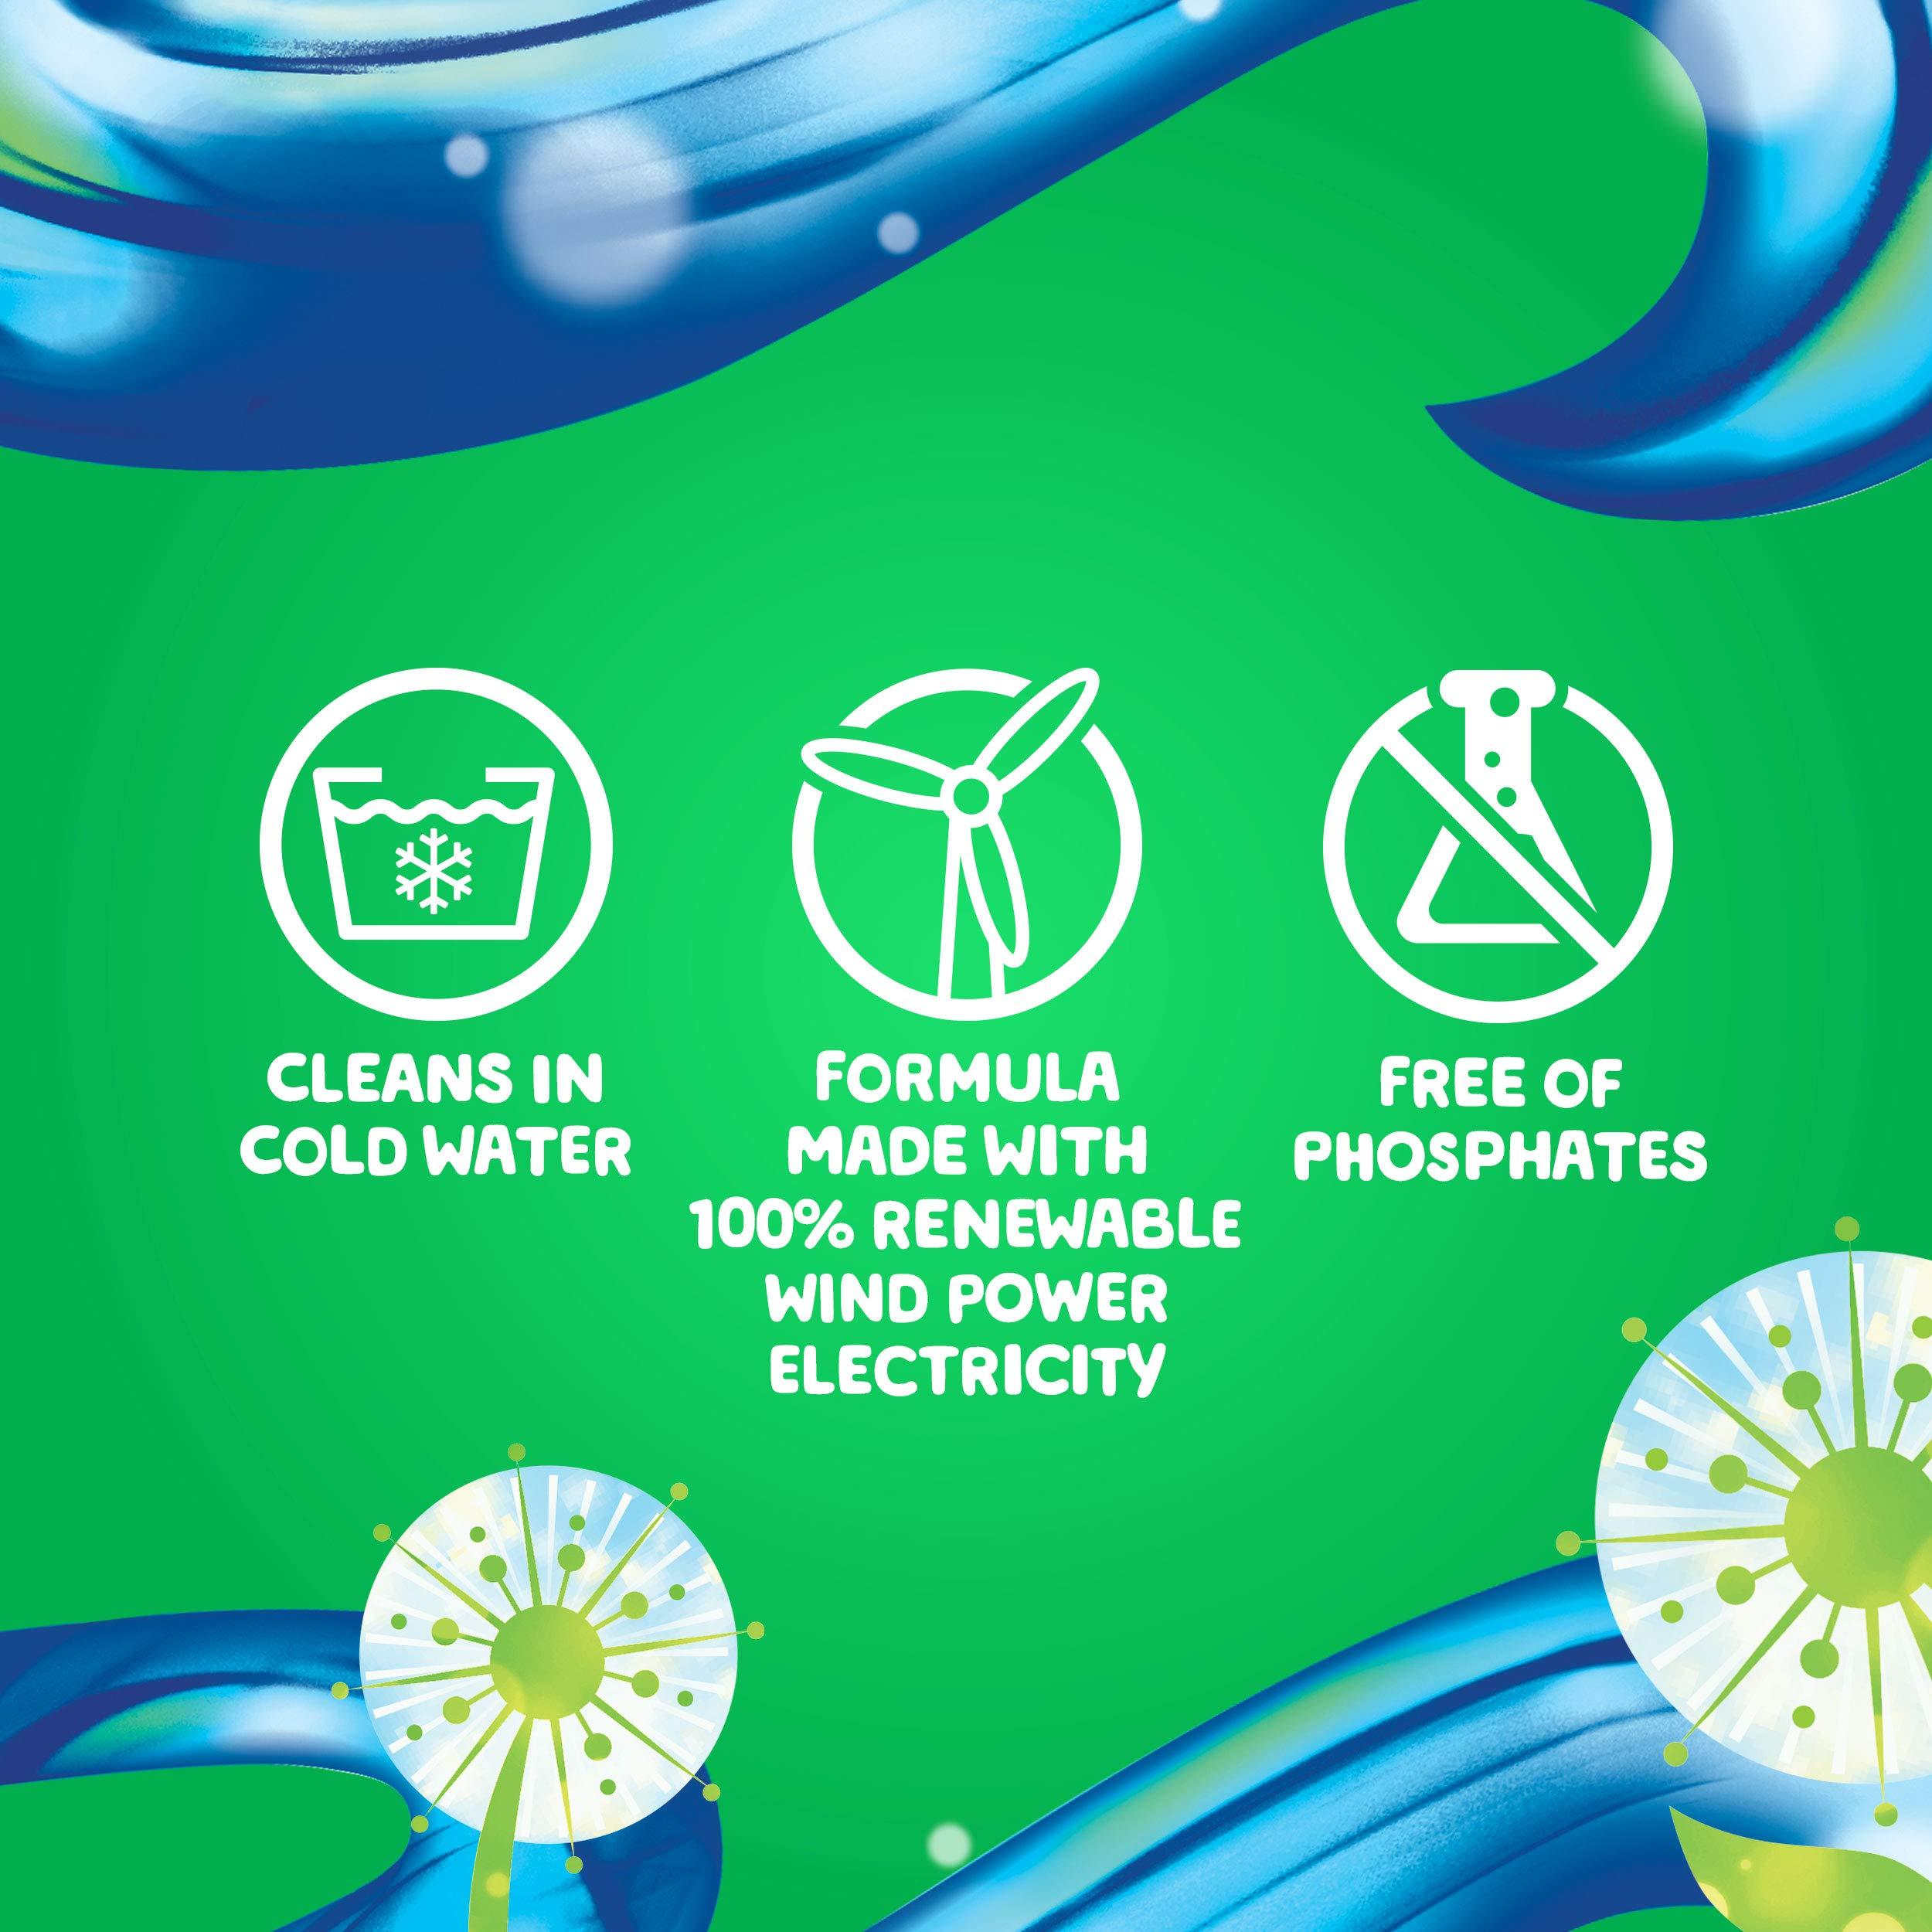 Gain flings! Liquid Laundry Detergent Pacs, Blissful Breeze, 96 Count by Gain (Image #10)